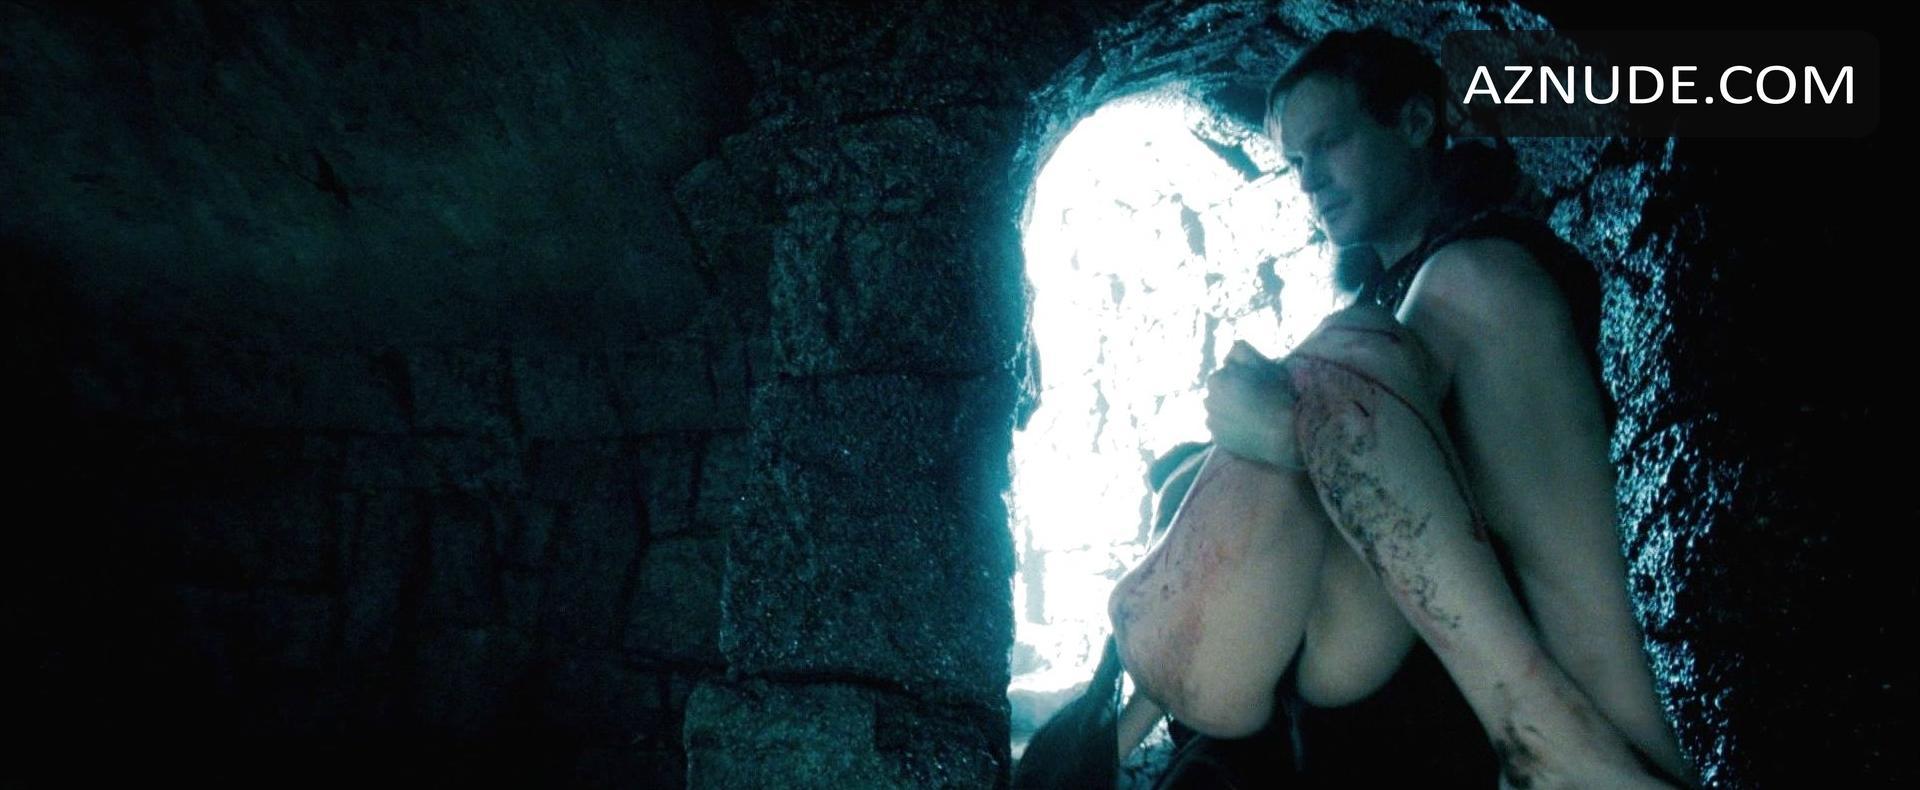 Kate beckinsale nude scene in new underworld